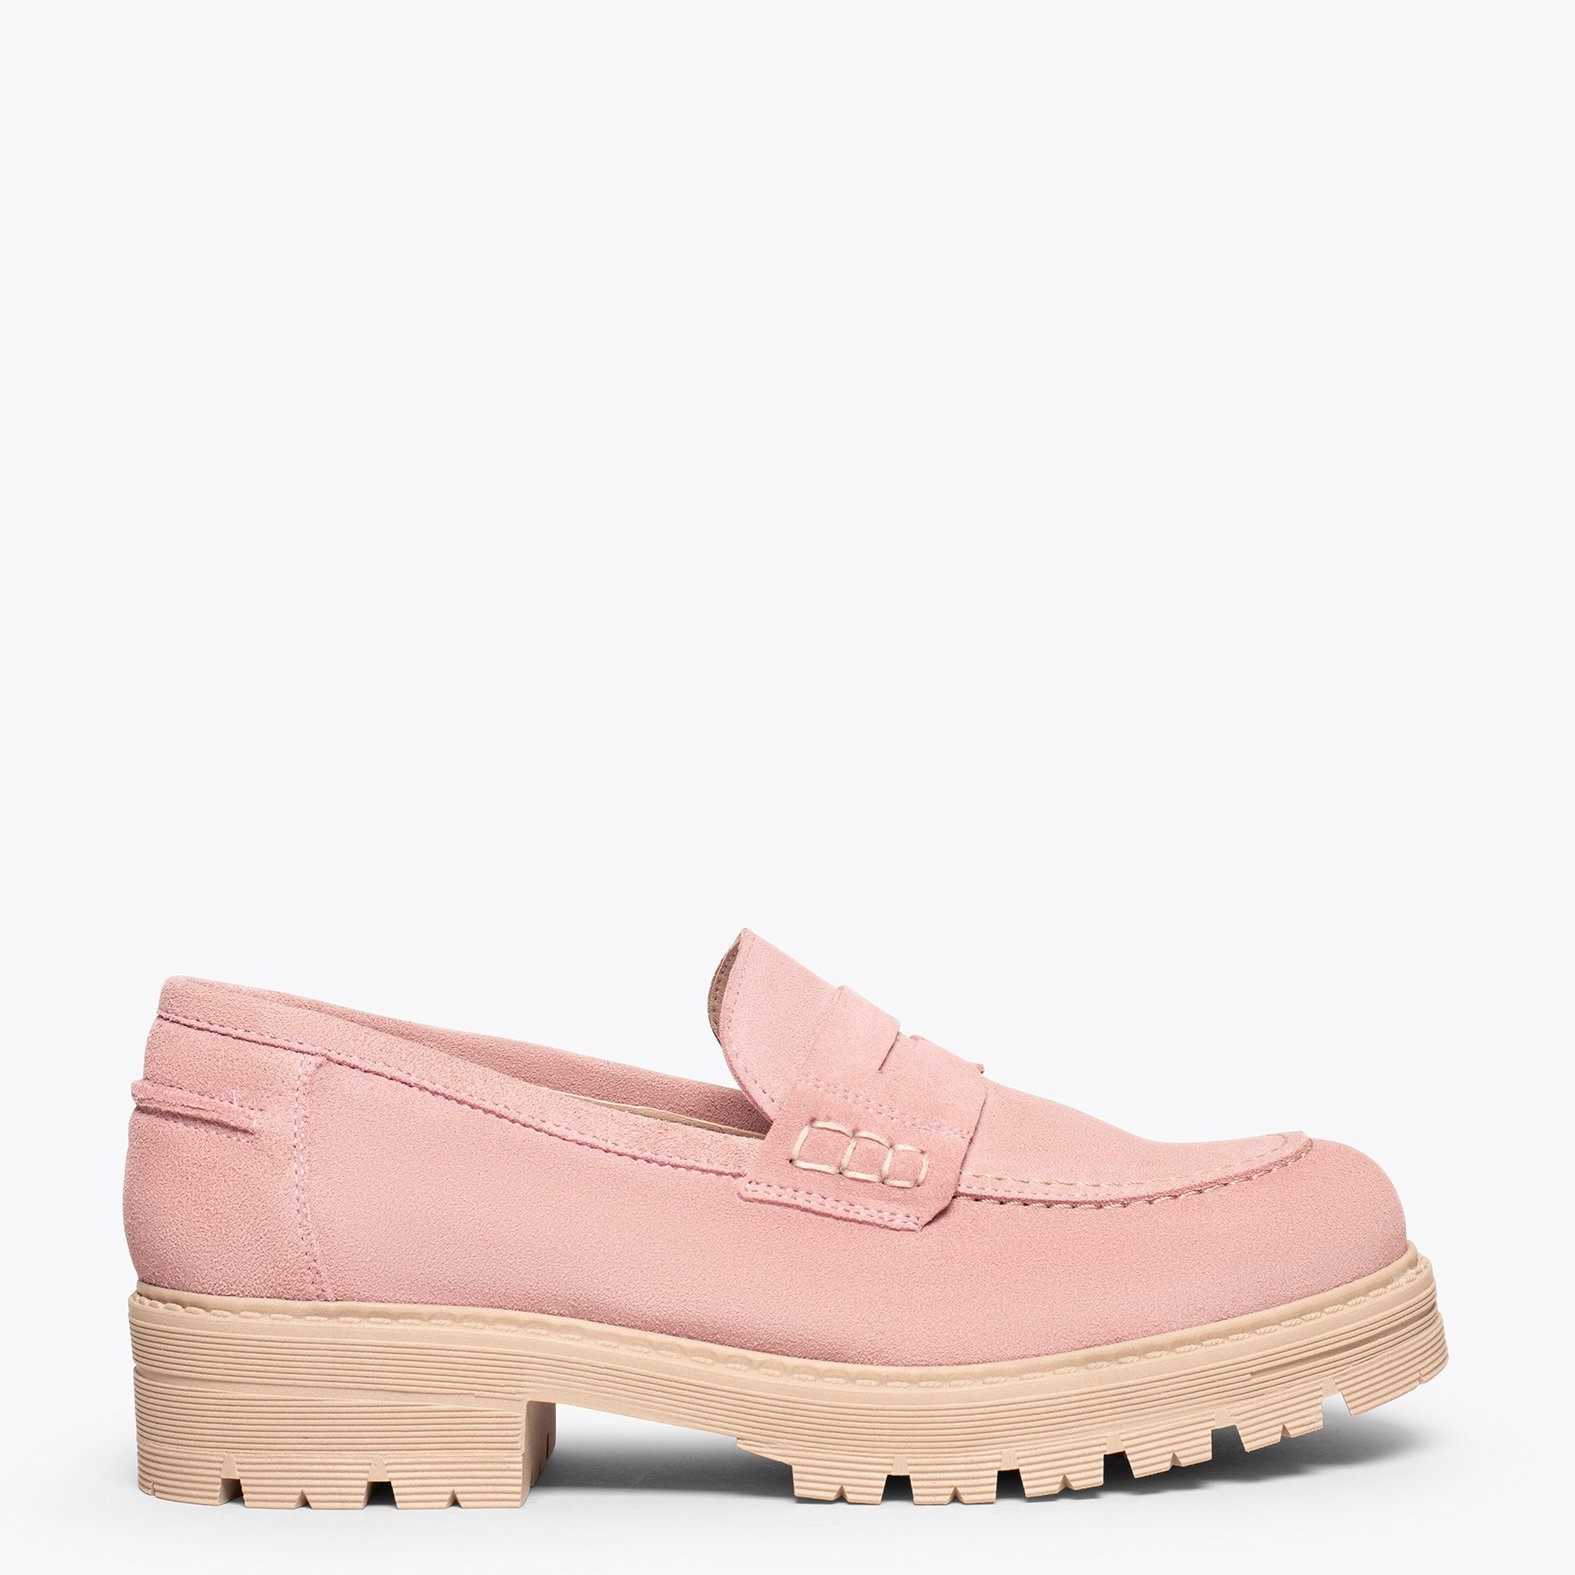 STILETTO Zapato con tacón fino BEIG